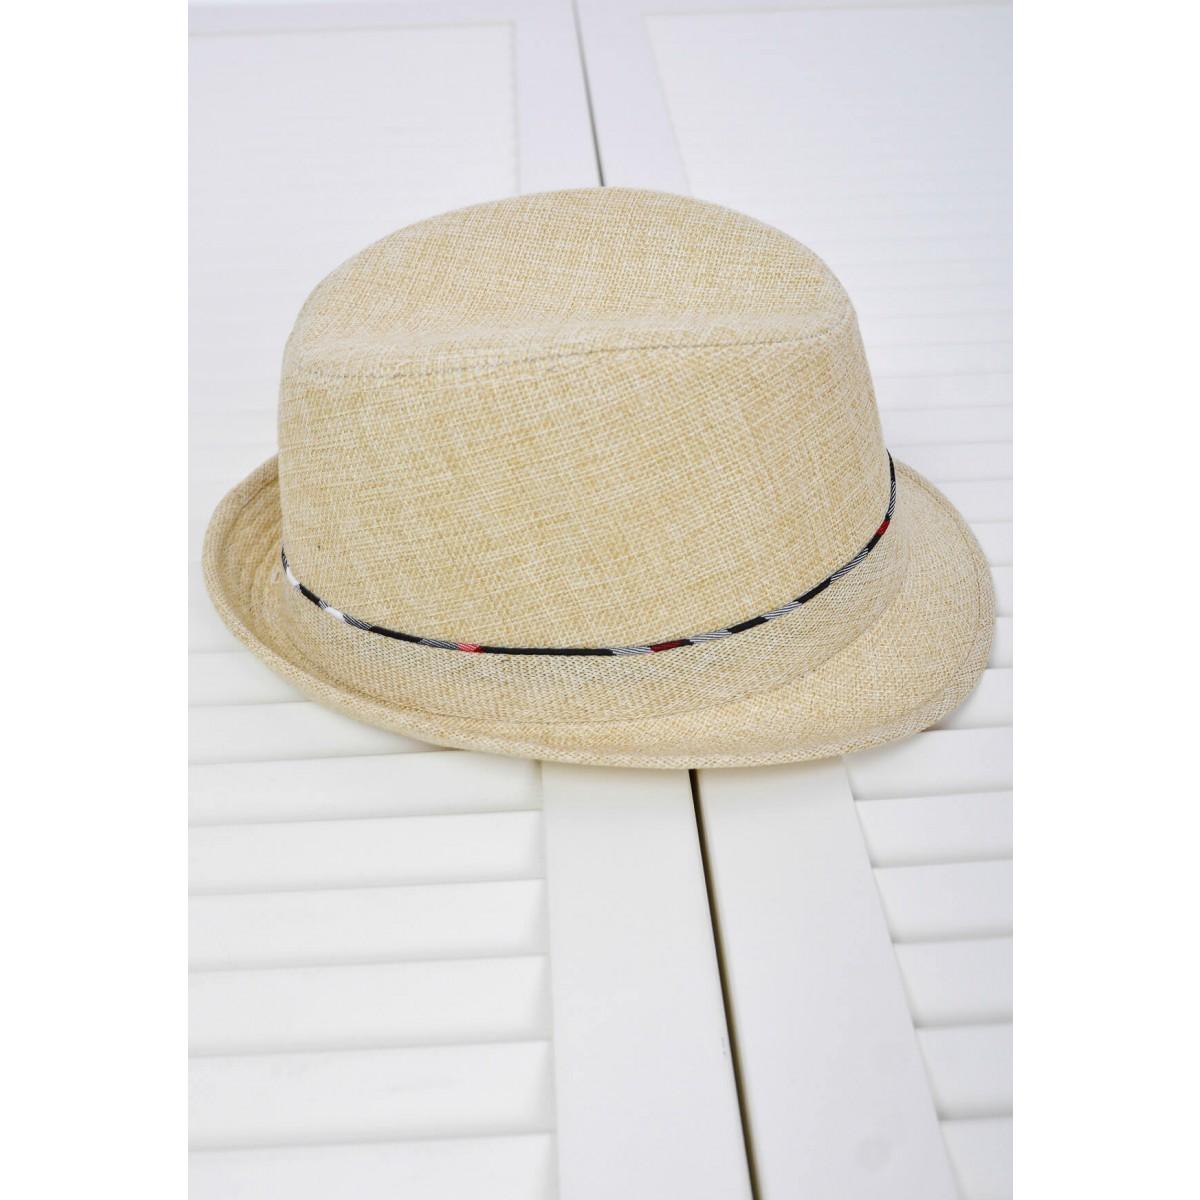 db4378e3129b dámsky klobúk